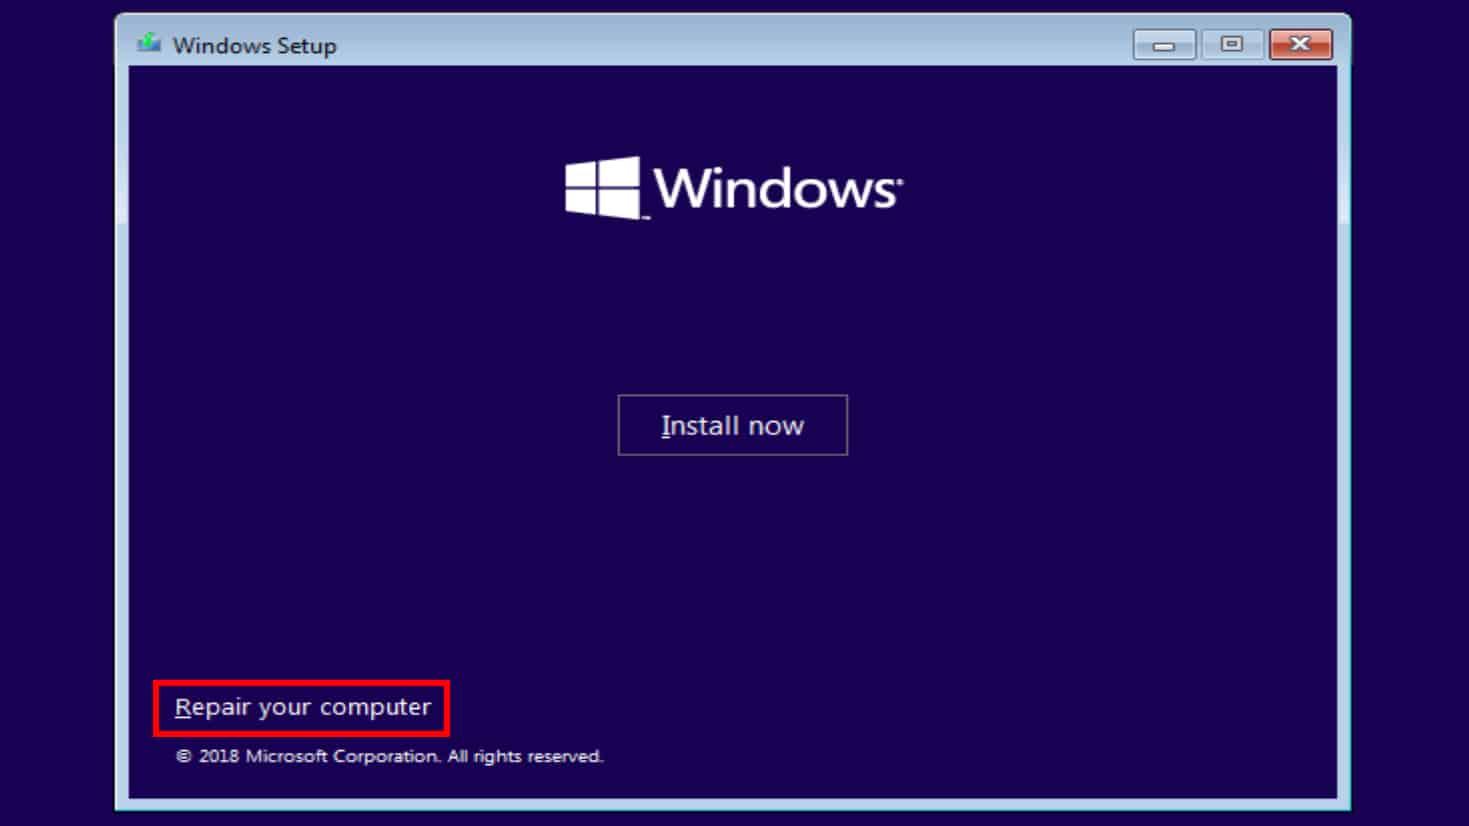 Windows 10 repair your computer